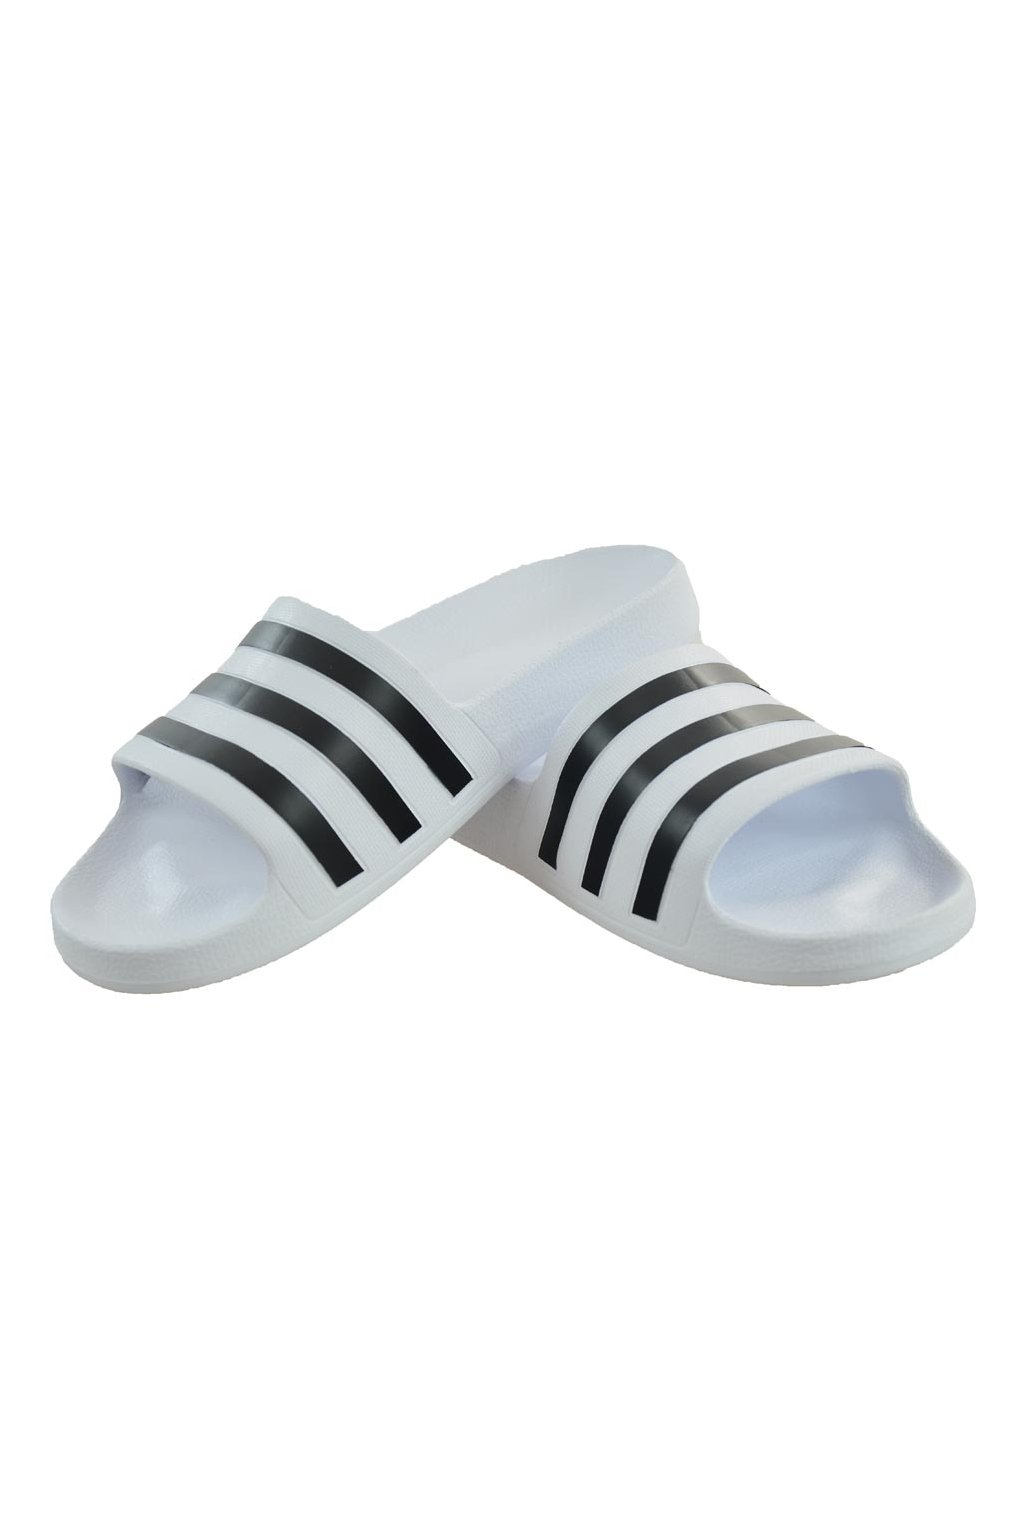 Šľapky adidas Adilette Aqua biele F35539